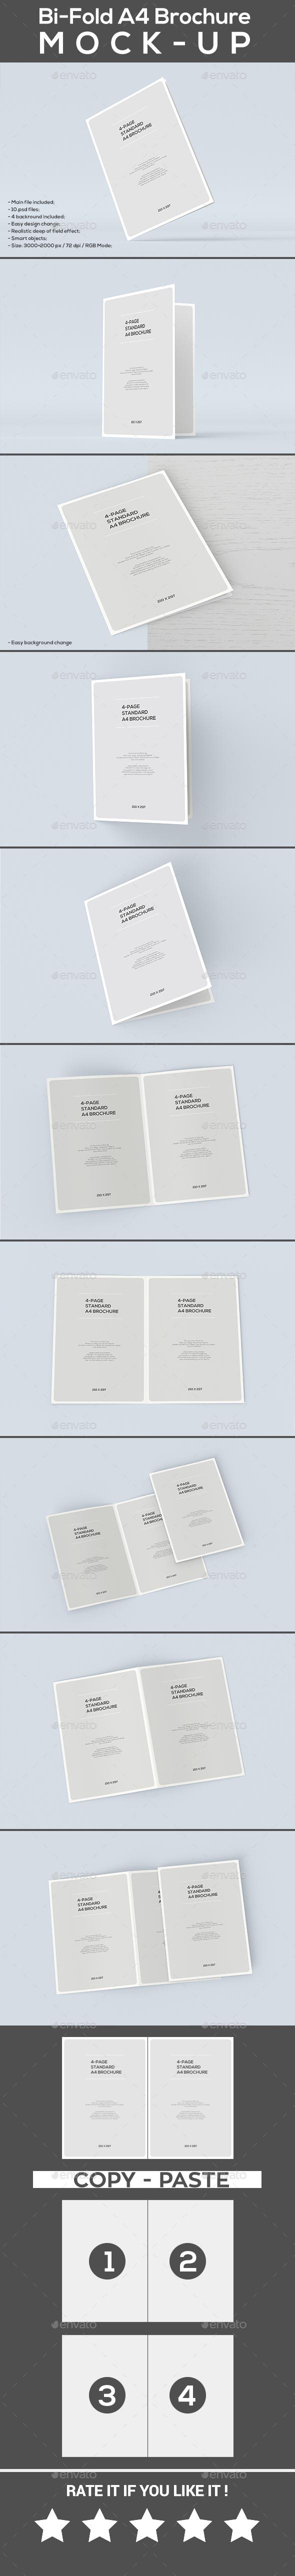 Bi-Fold A4 Brochure MOCK-UP - Brochures Print